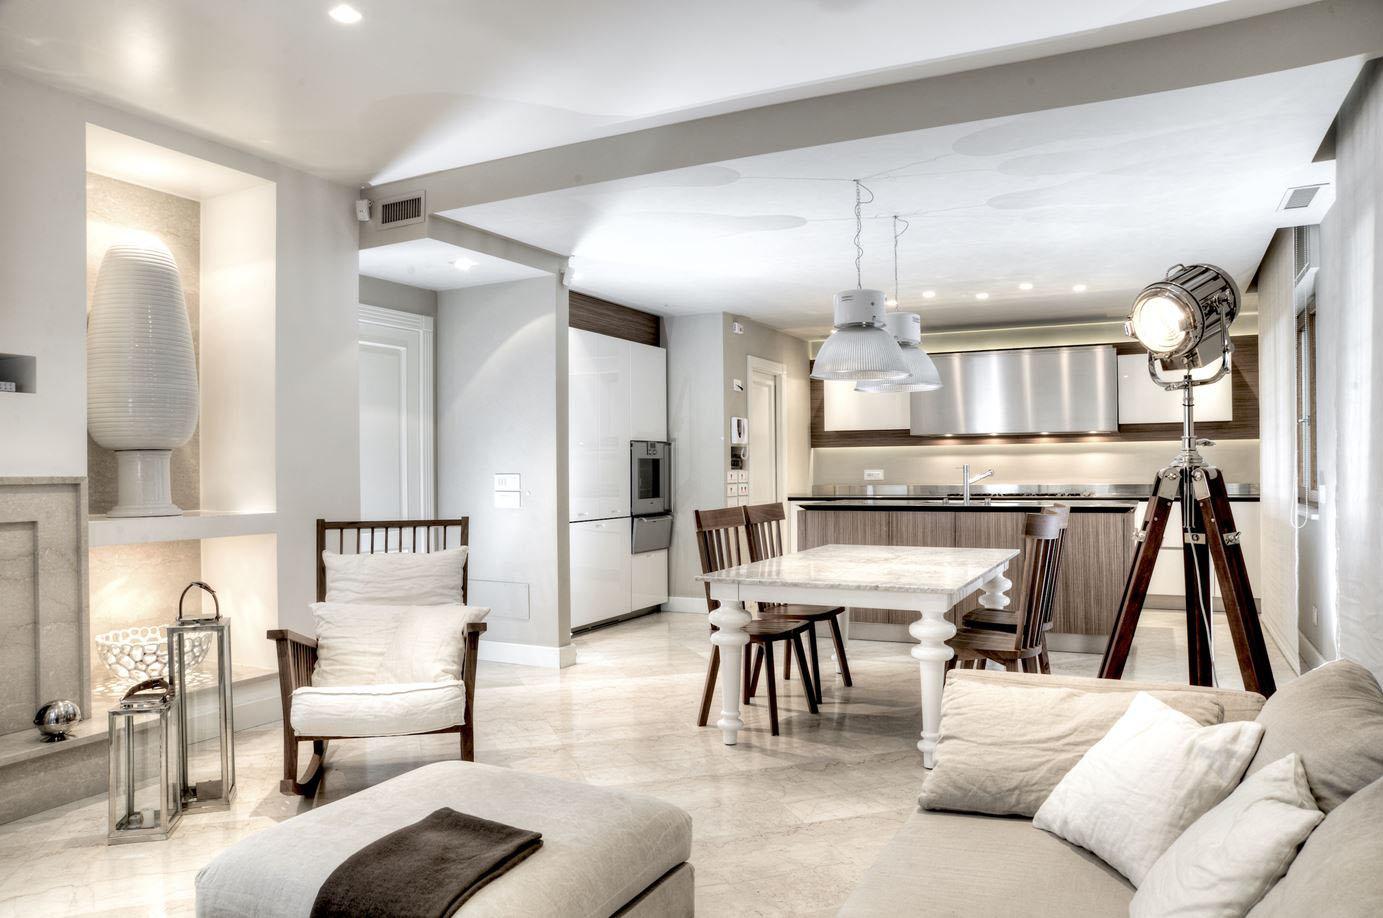 Luxury Home Interior With Timeless Contemporary Elegance   iDesignArch   Interior Design ...